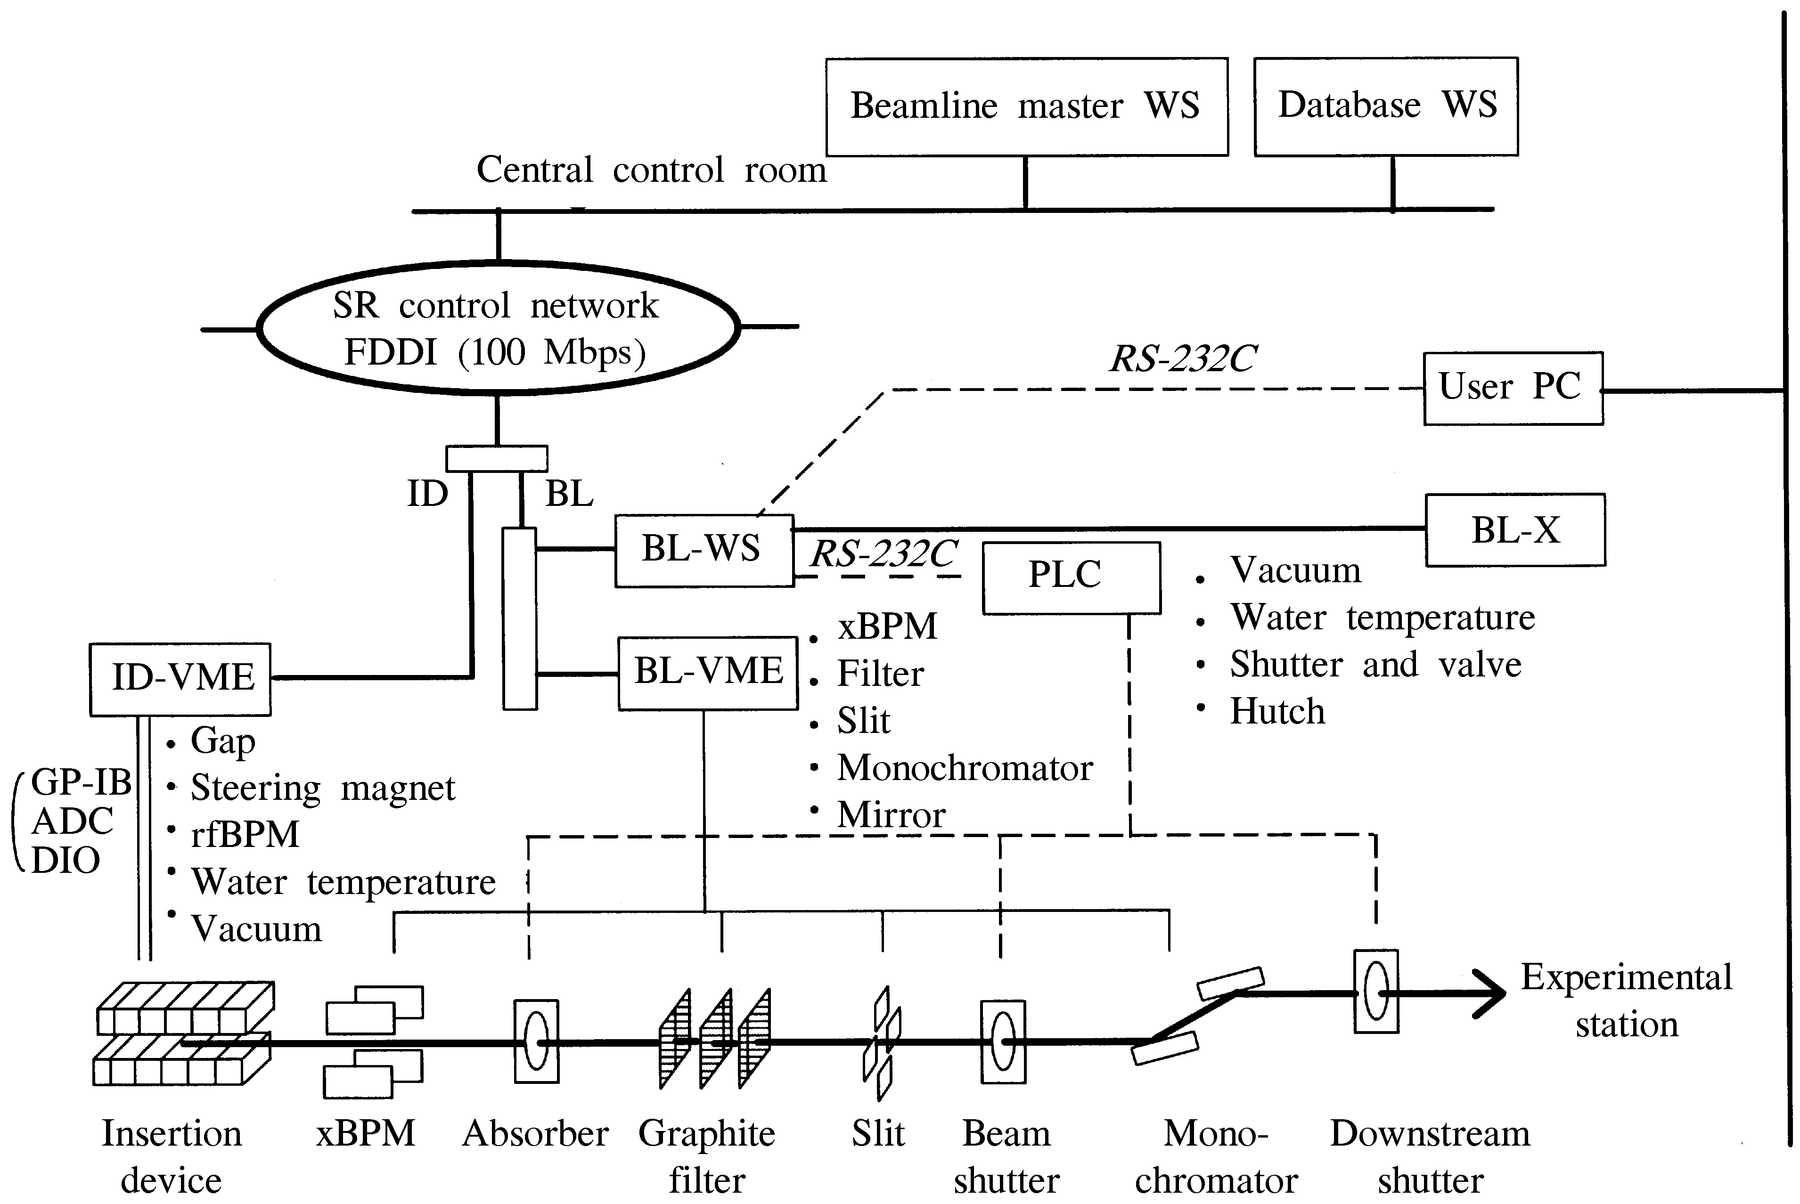 Iucr spring 8 beamline control system figure 1 pooptronica